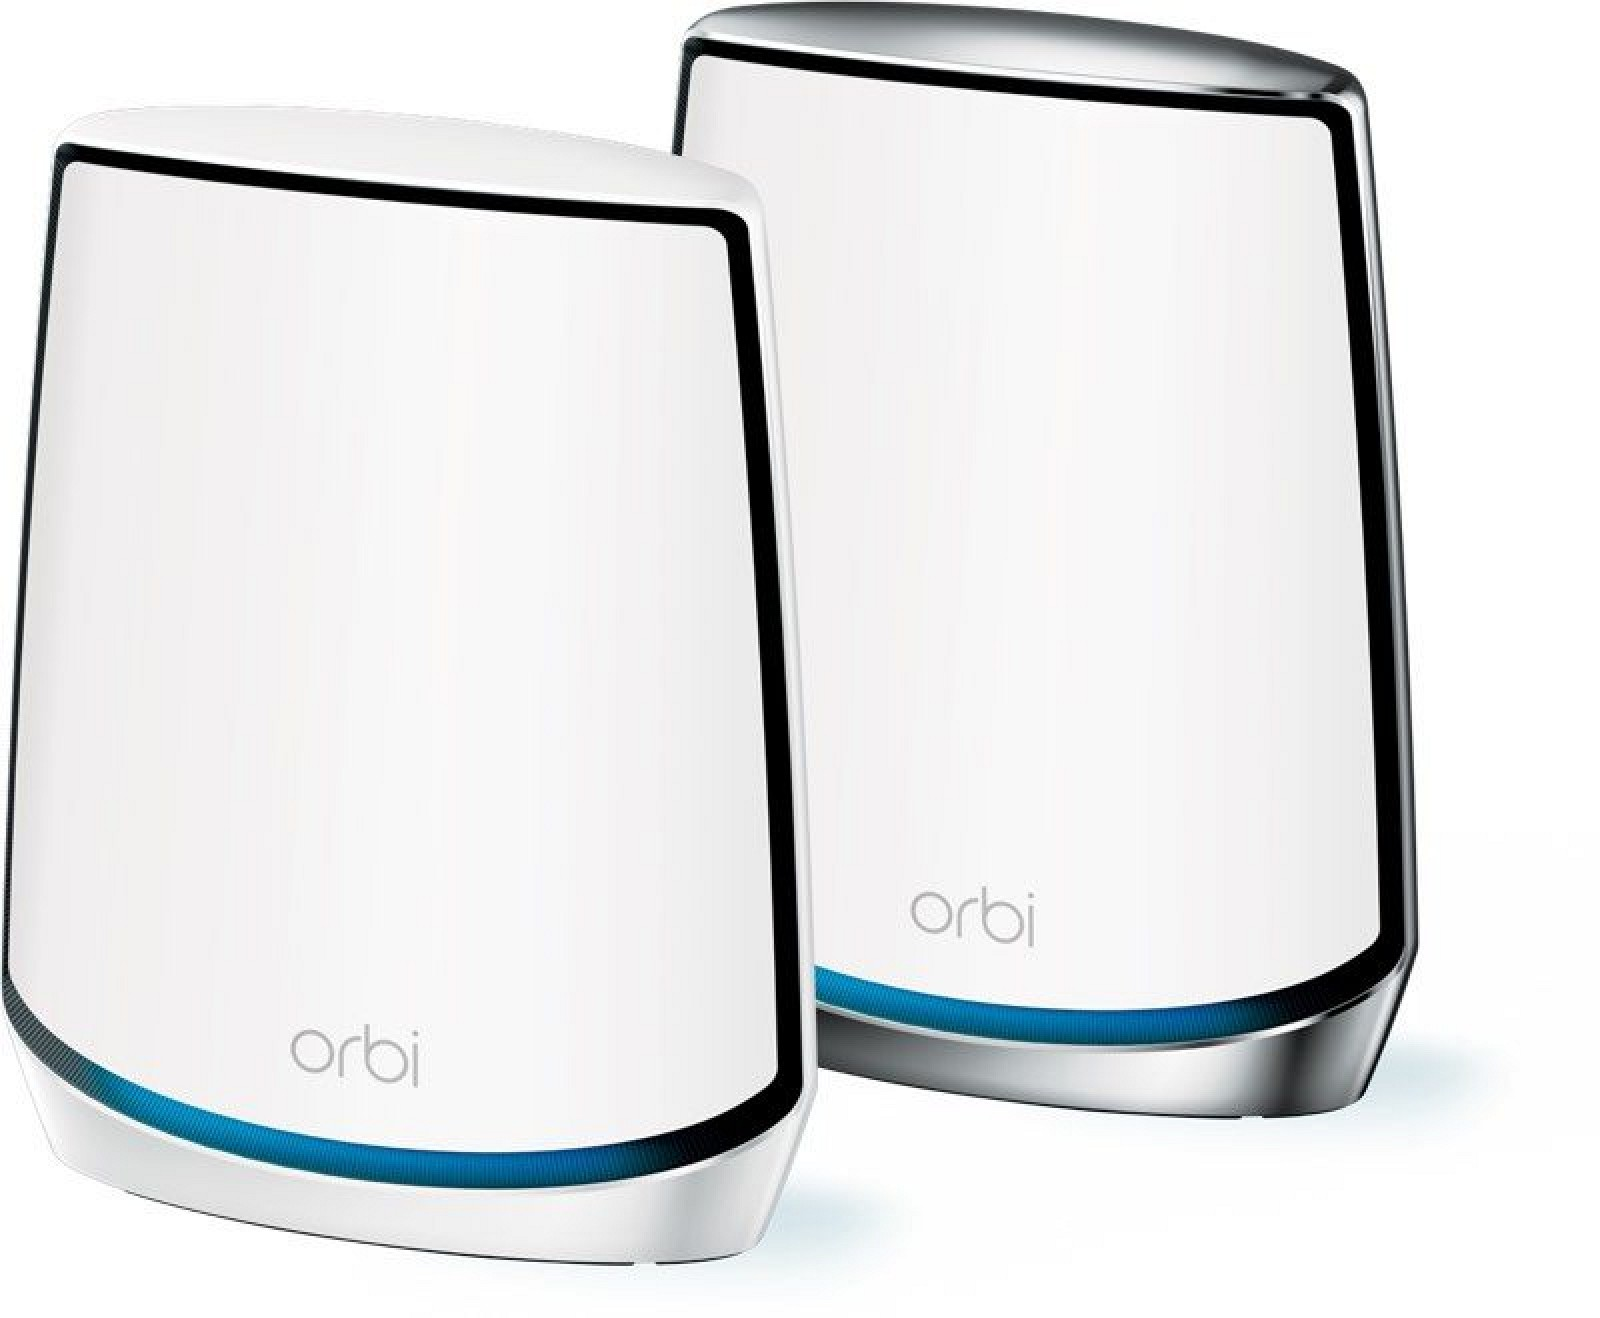 QnA VBage CES 2019: Netgear Unveils New Orbi 802.11ax Mesh Wi-Fi System for Gigabit Internet